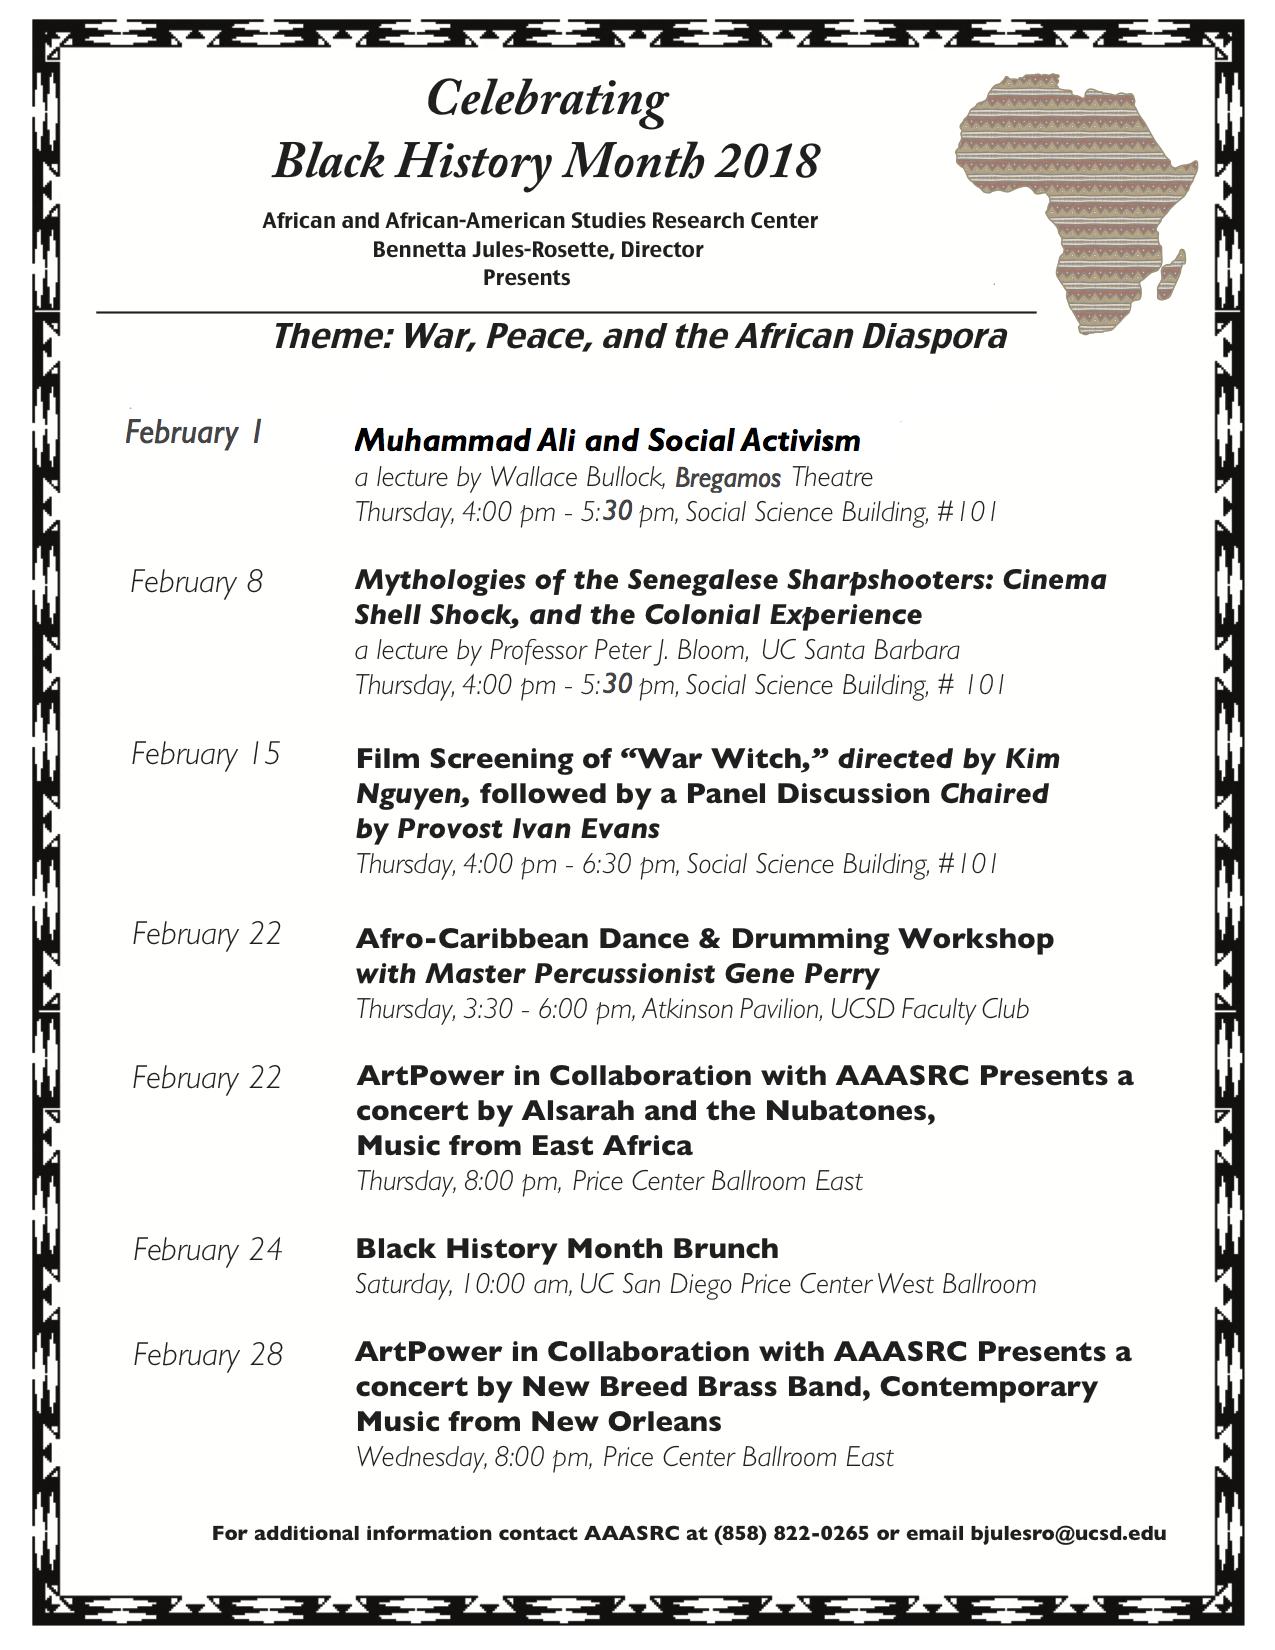 Black History Month Calendar, 2018 | aaasrc.ucsd.edu